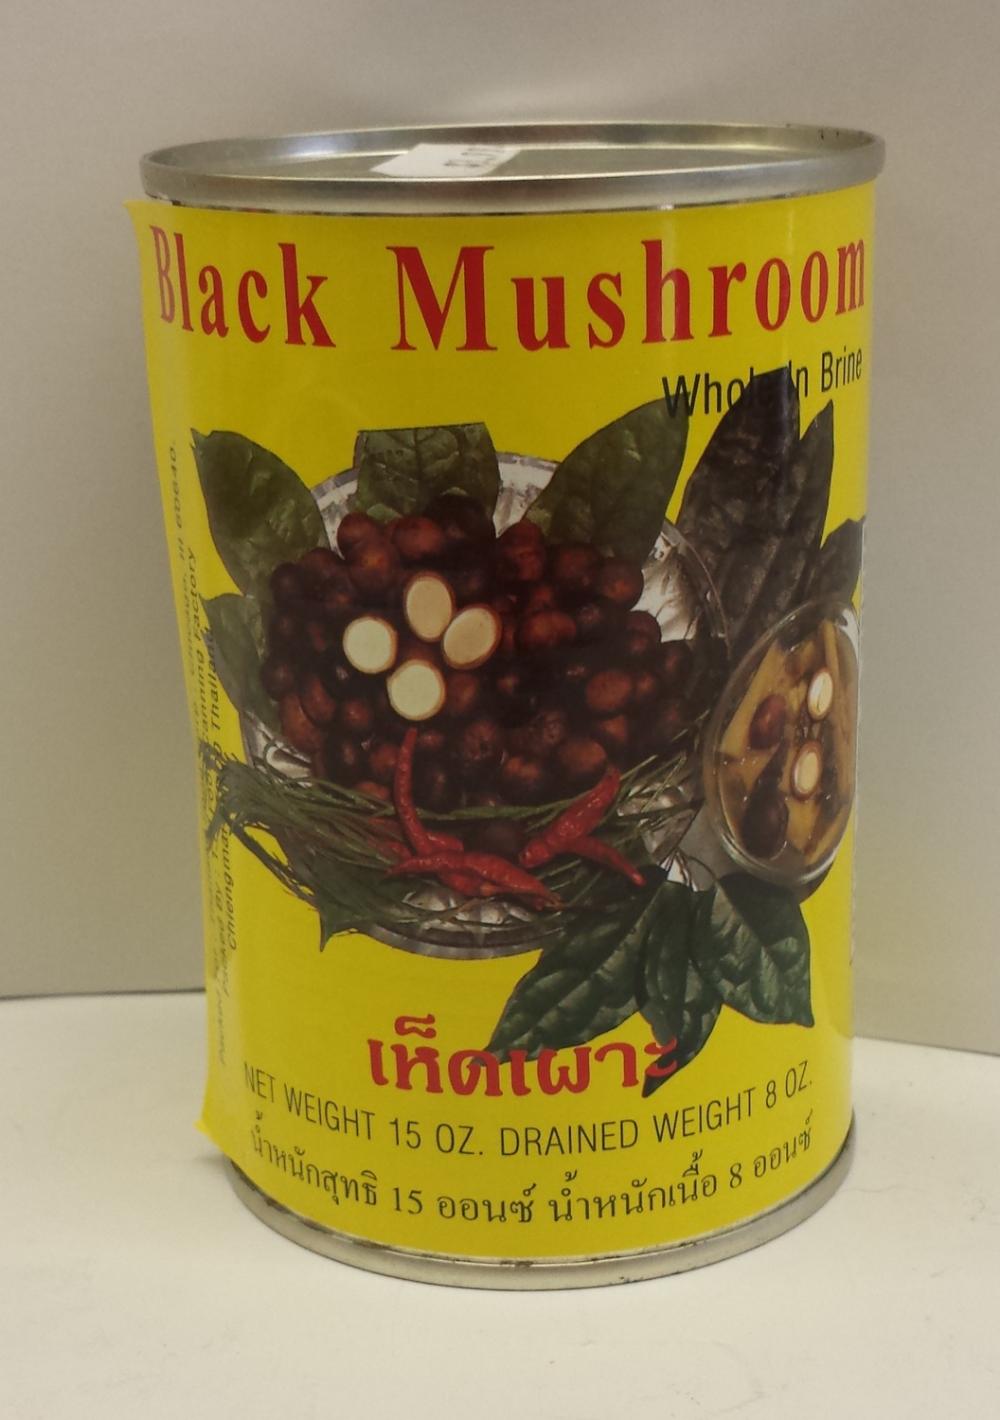 Black Mushroom    Sumpao Boat   MU12099 24x15 oz